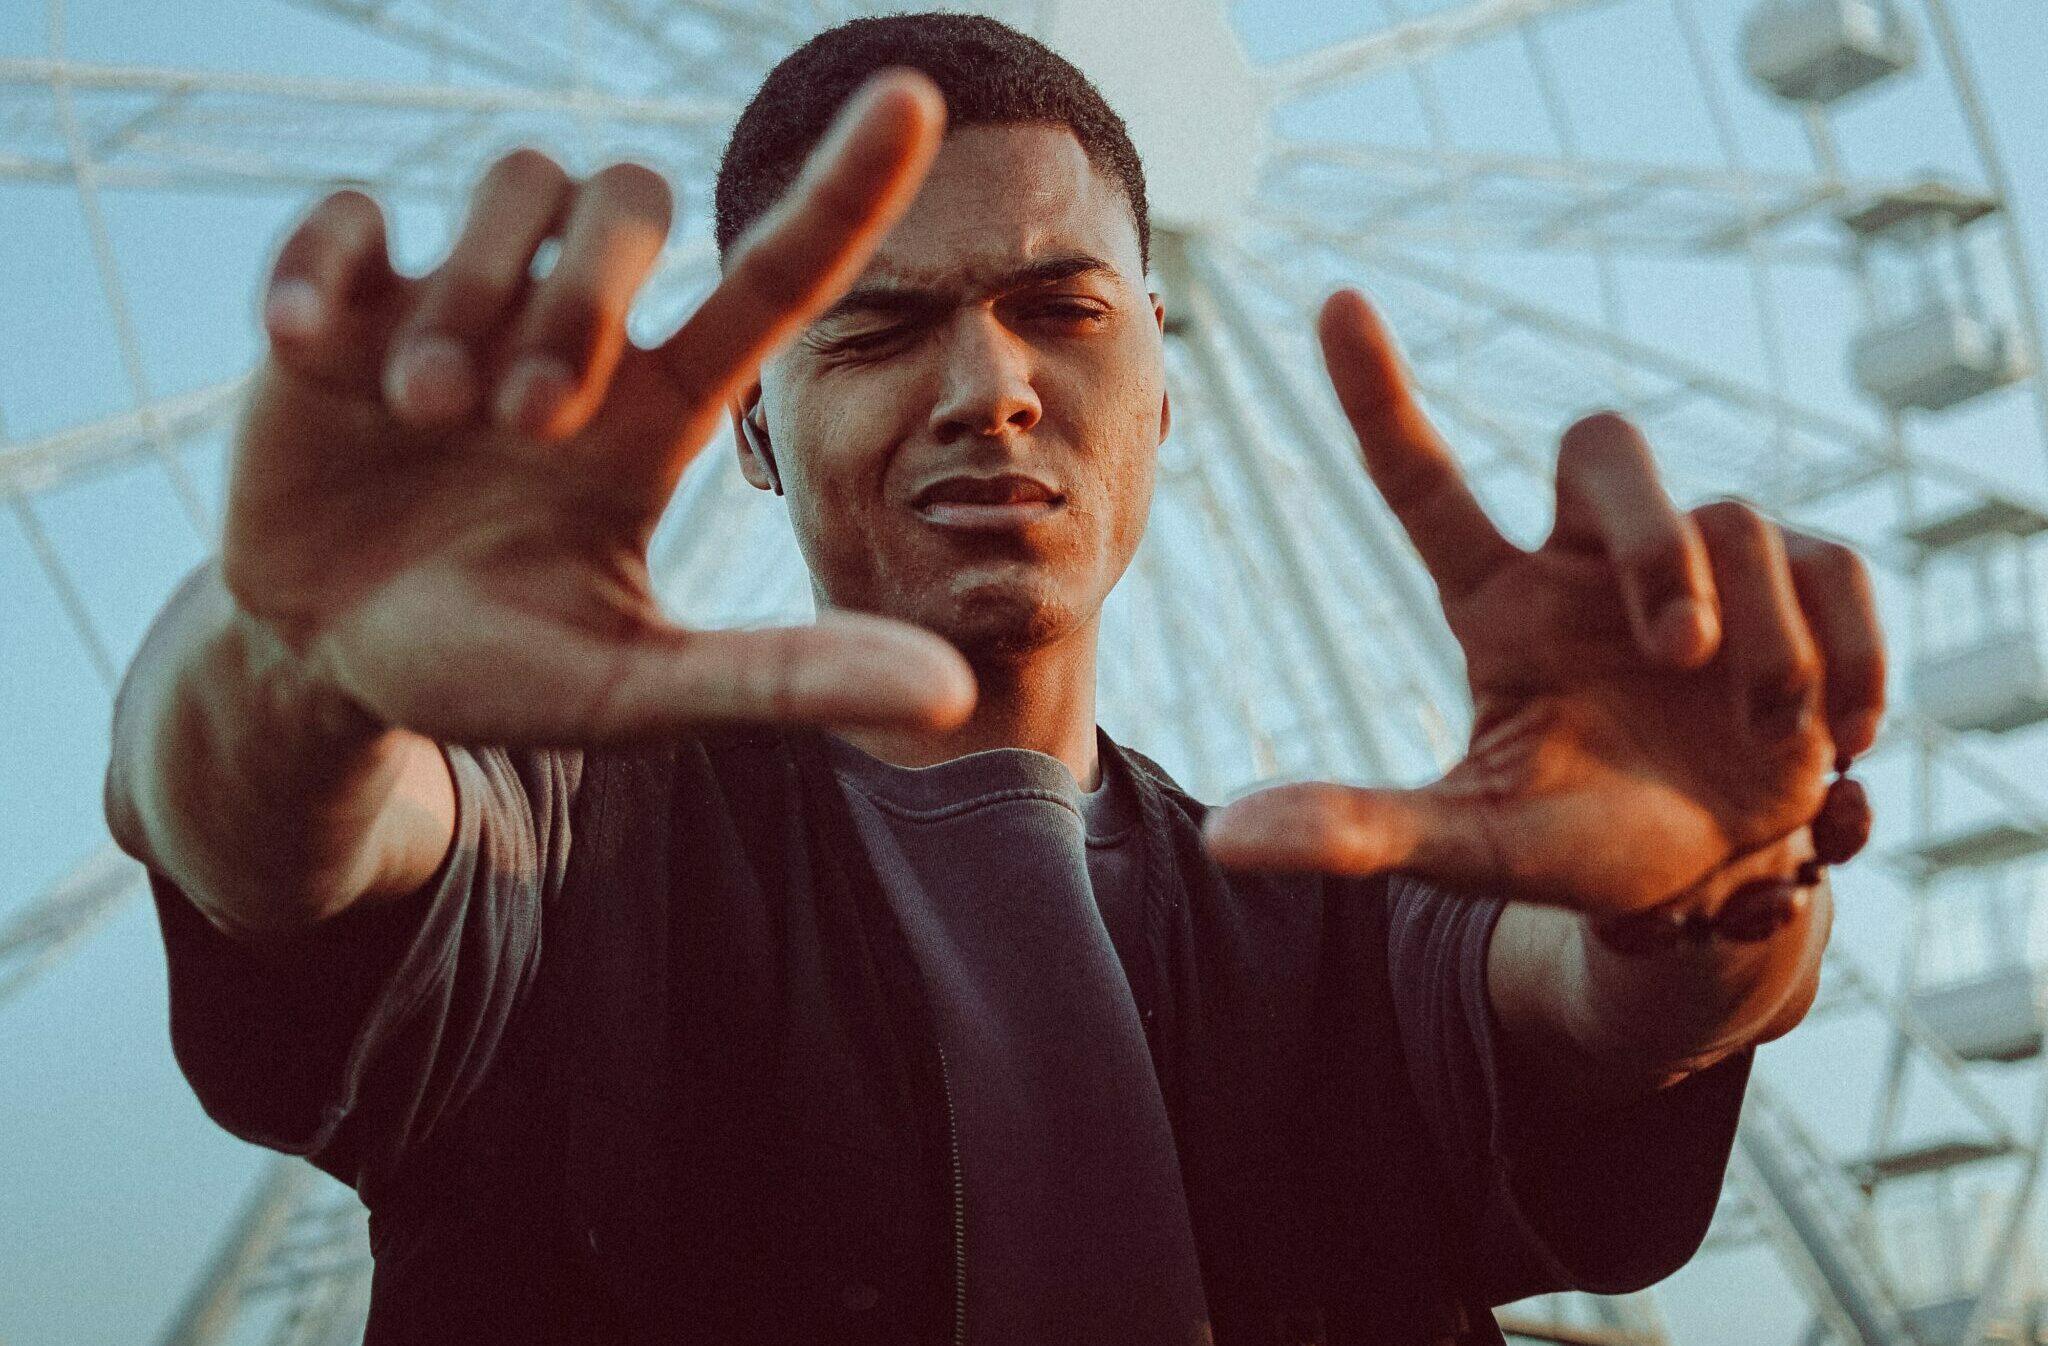 man in black long sleeve shirt raising his hands